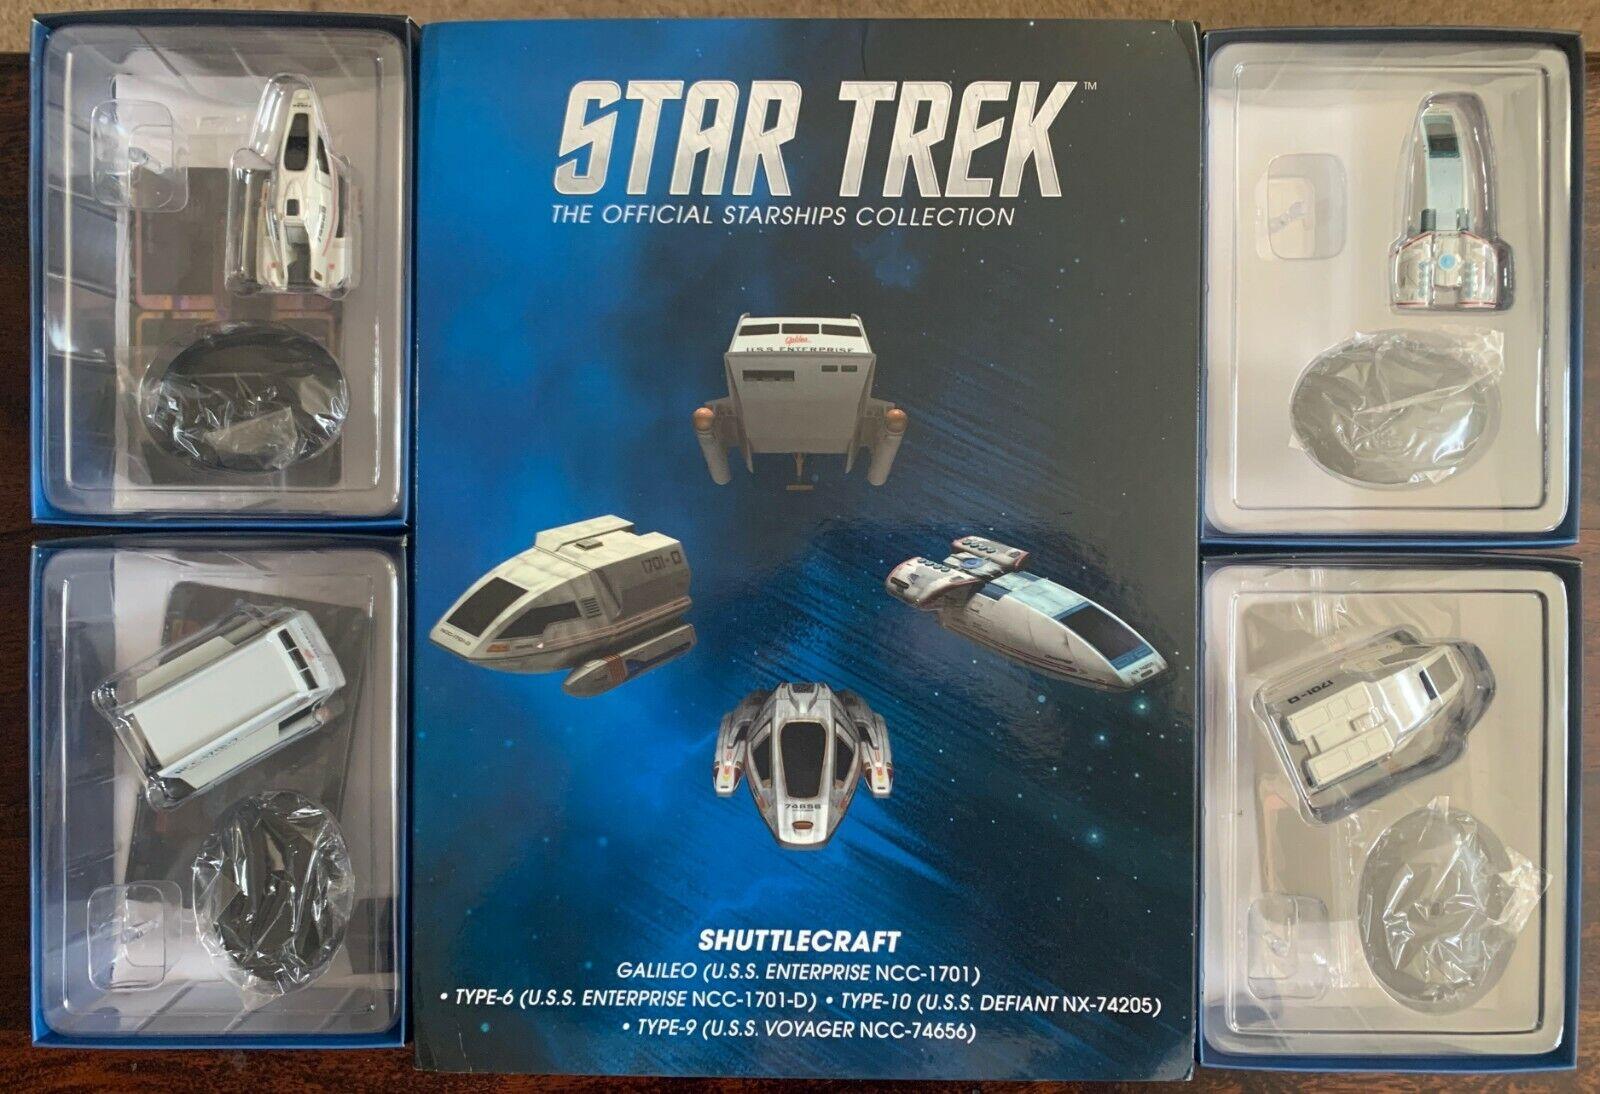 EAGLEMOSS  Star Trek Starships Shuttlecraft Set 1  nous prenons les clients comme notre dieu